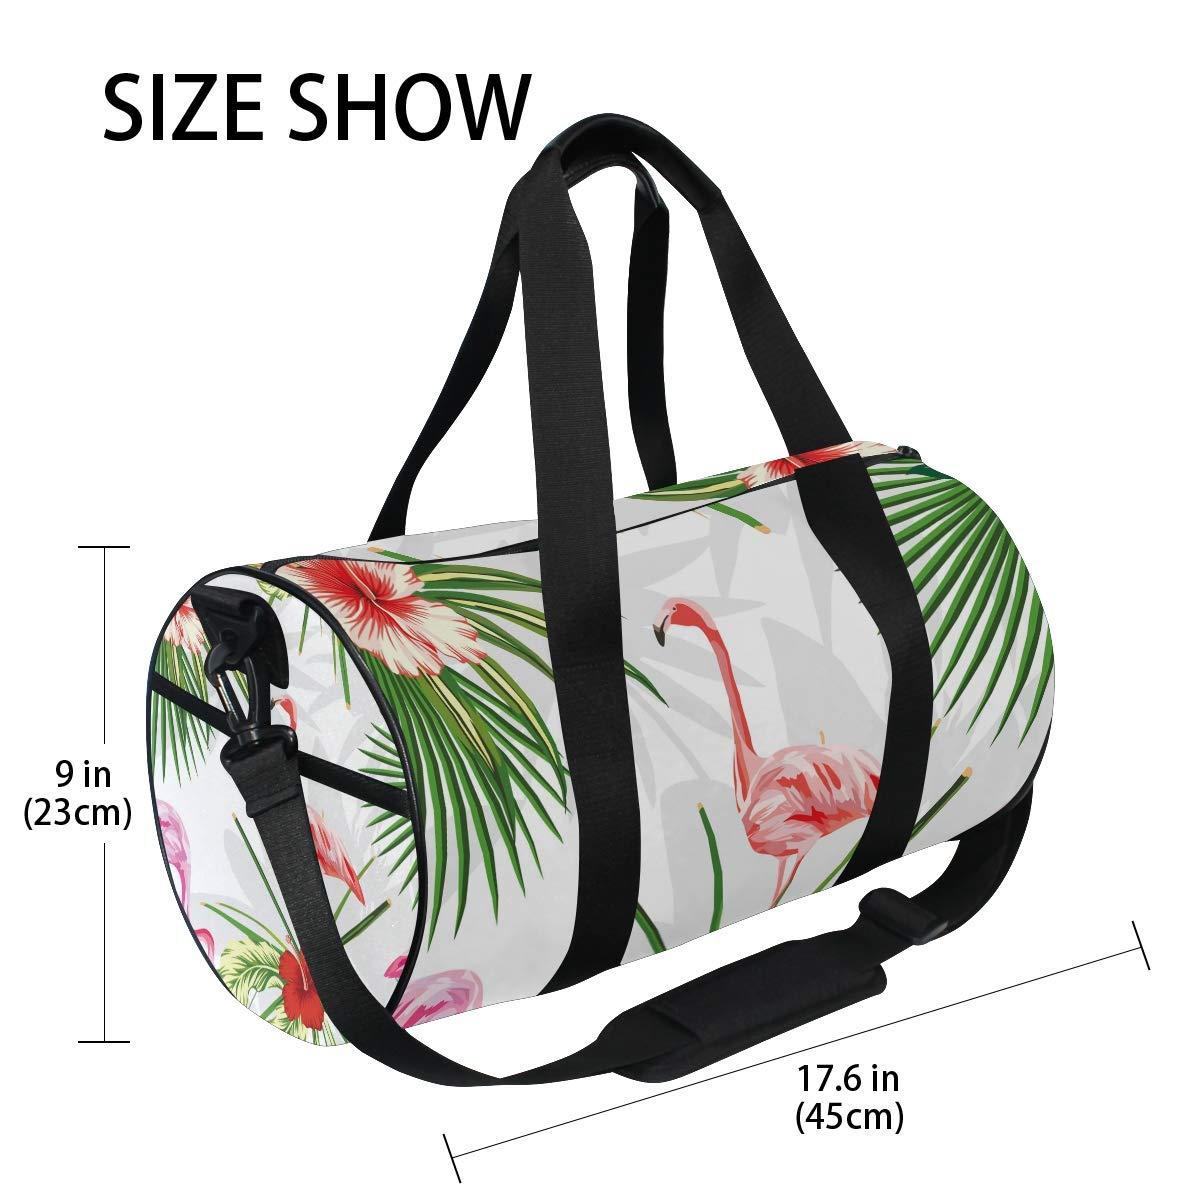 Flamingo Sports Gym Bag Travel Duffel Bag with Pockets Luggage & Travel Gear Shoulder Strap Fitness Bag by EVERUI (Image #4)